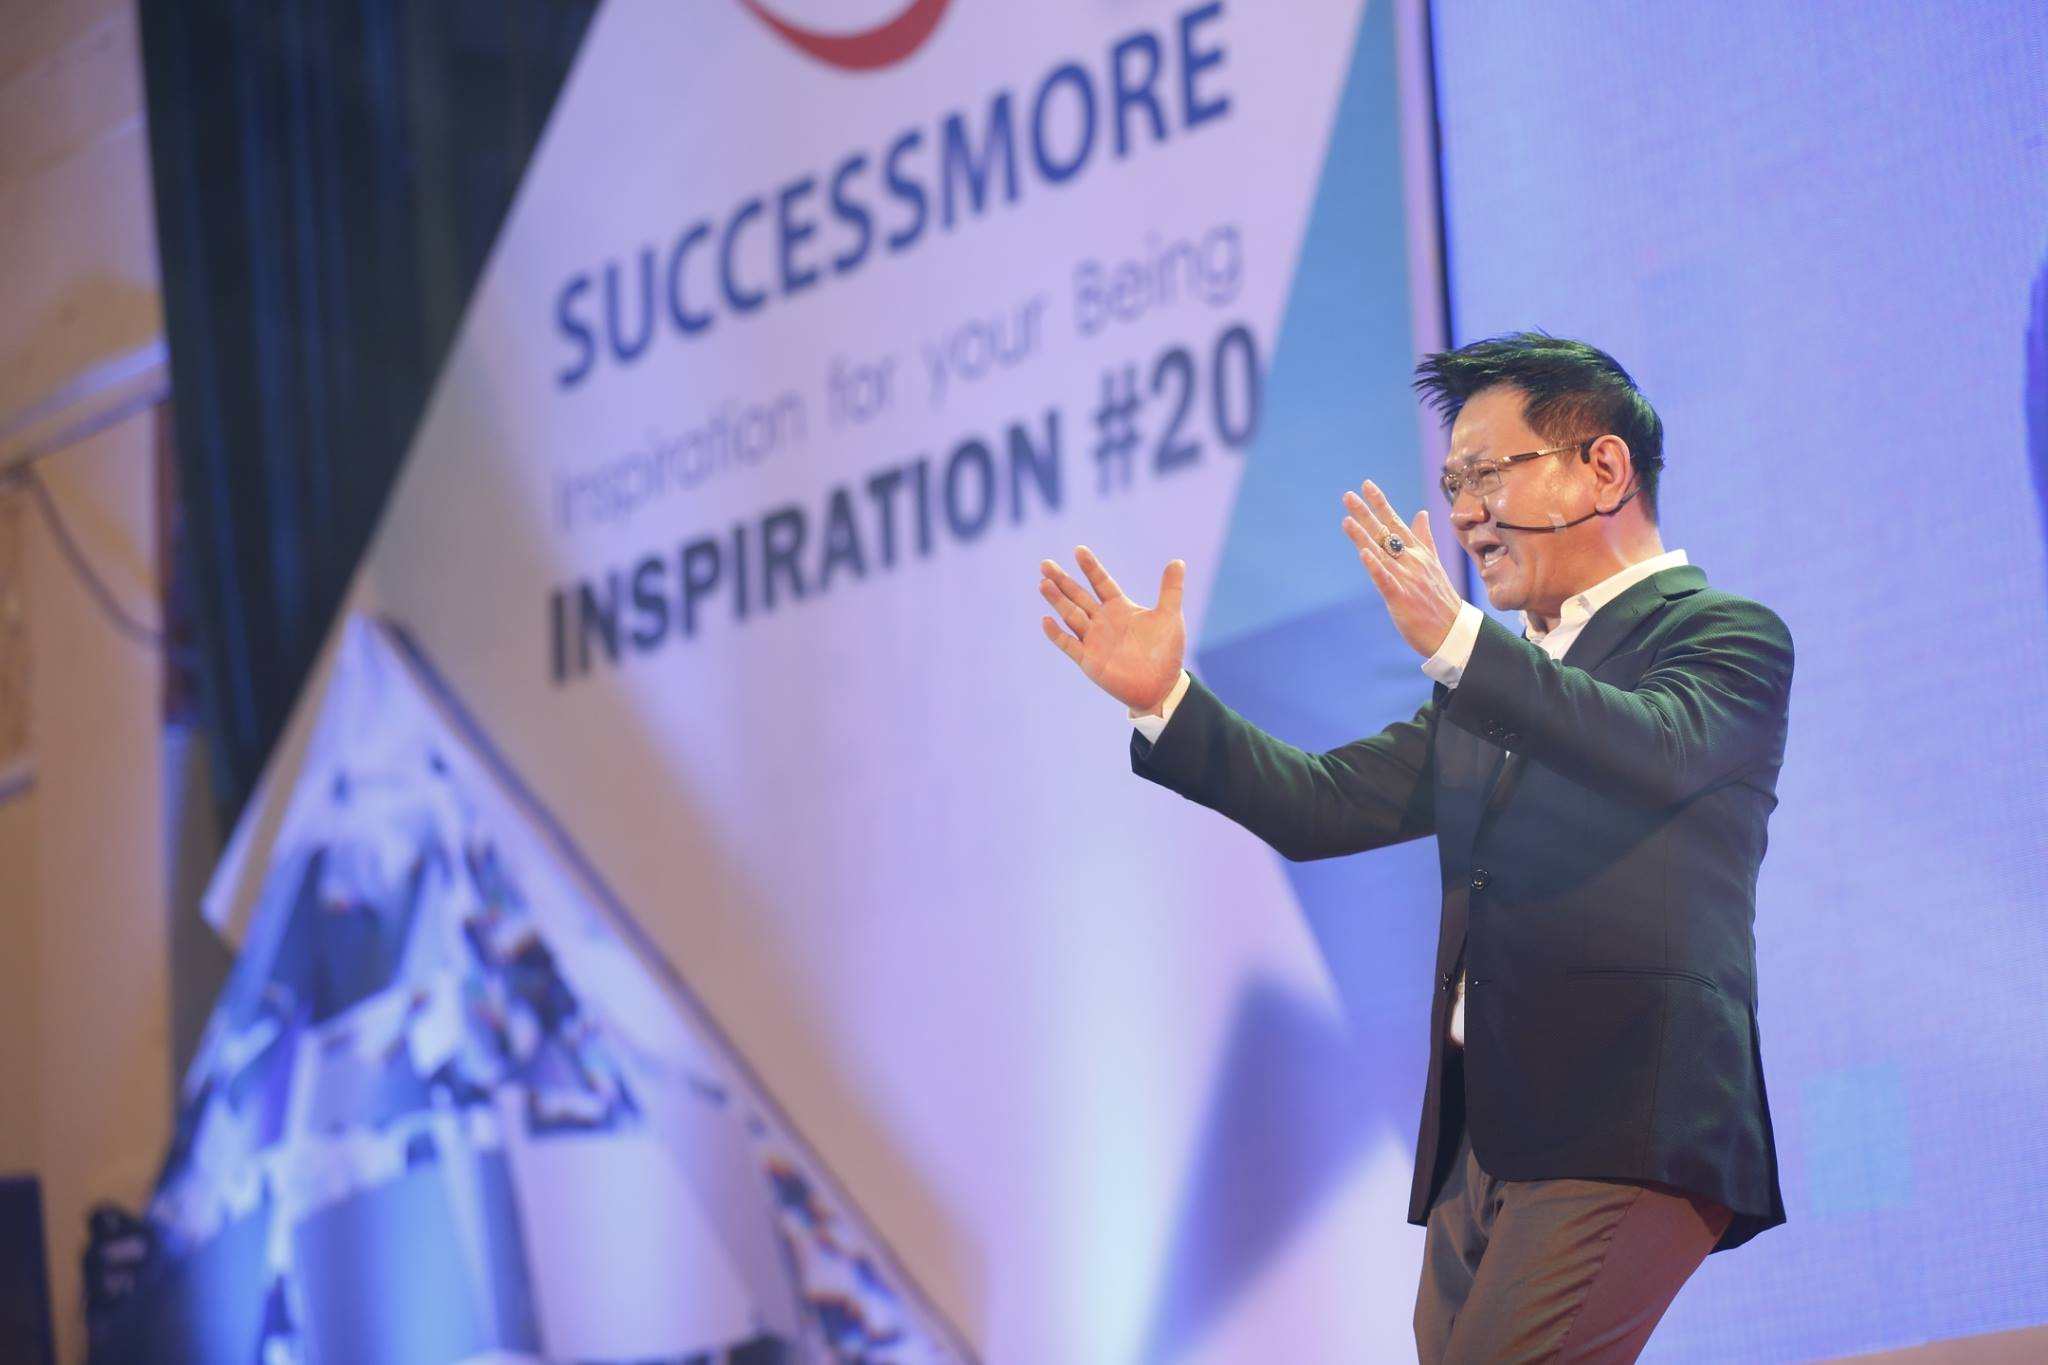 SUCCESSMORE INSPIRATION ครั้งที่ 20 Myanmar (1)